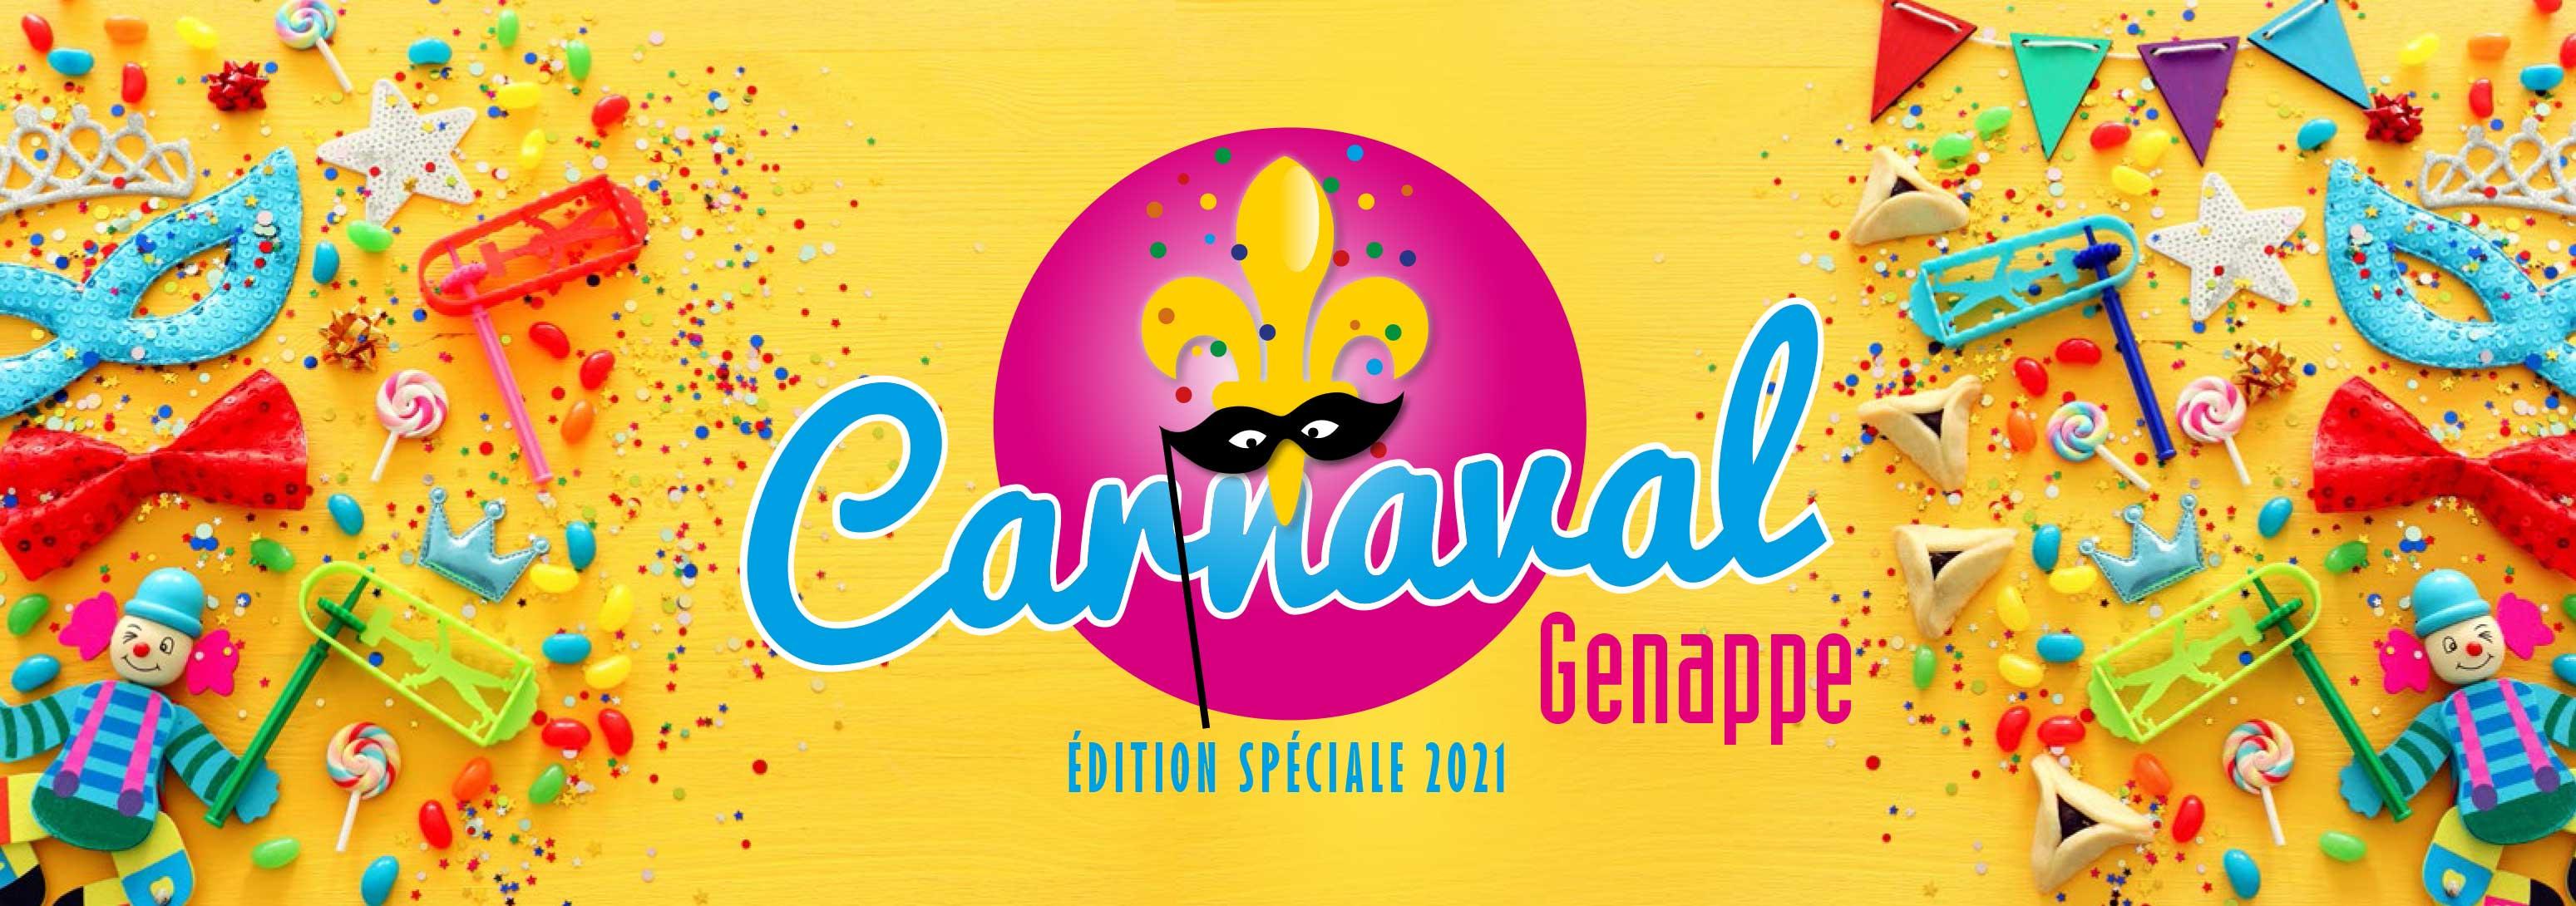 Image principale Carnaval 2021